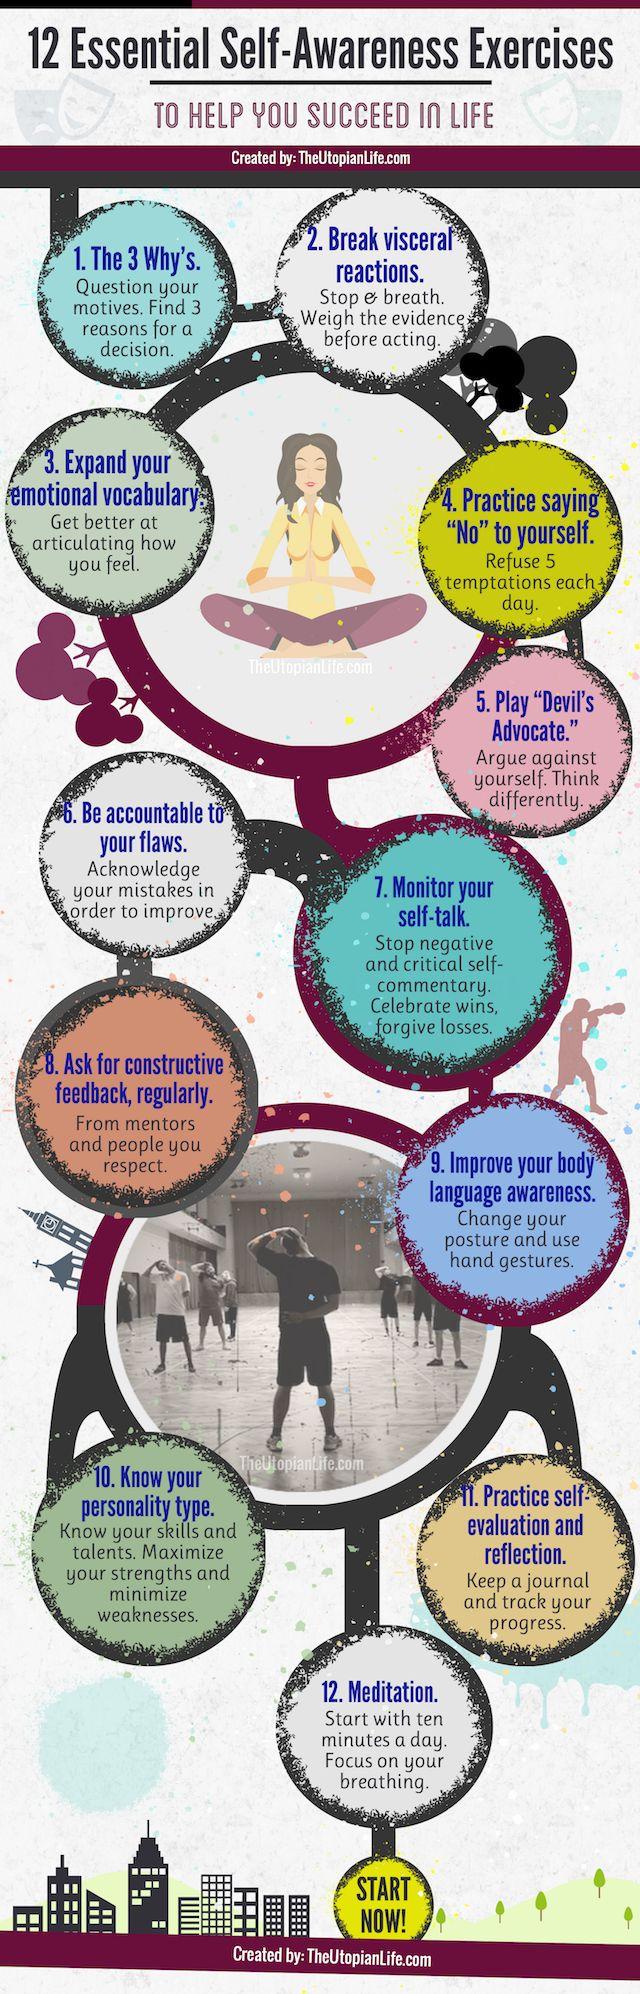 12 Essential Self-Awareness Exercises